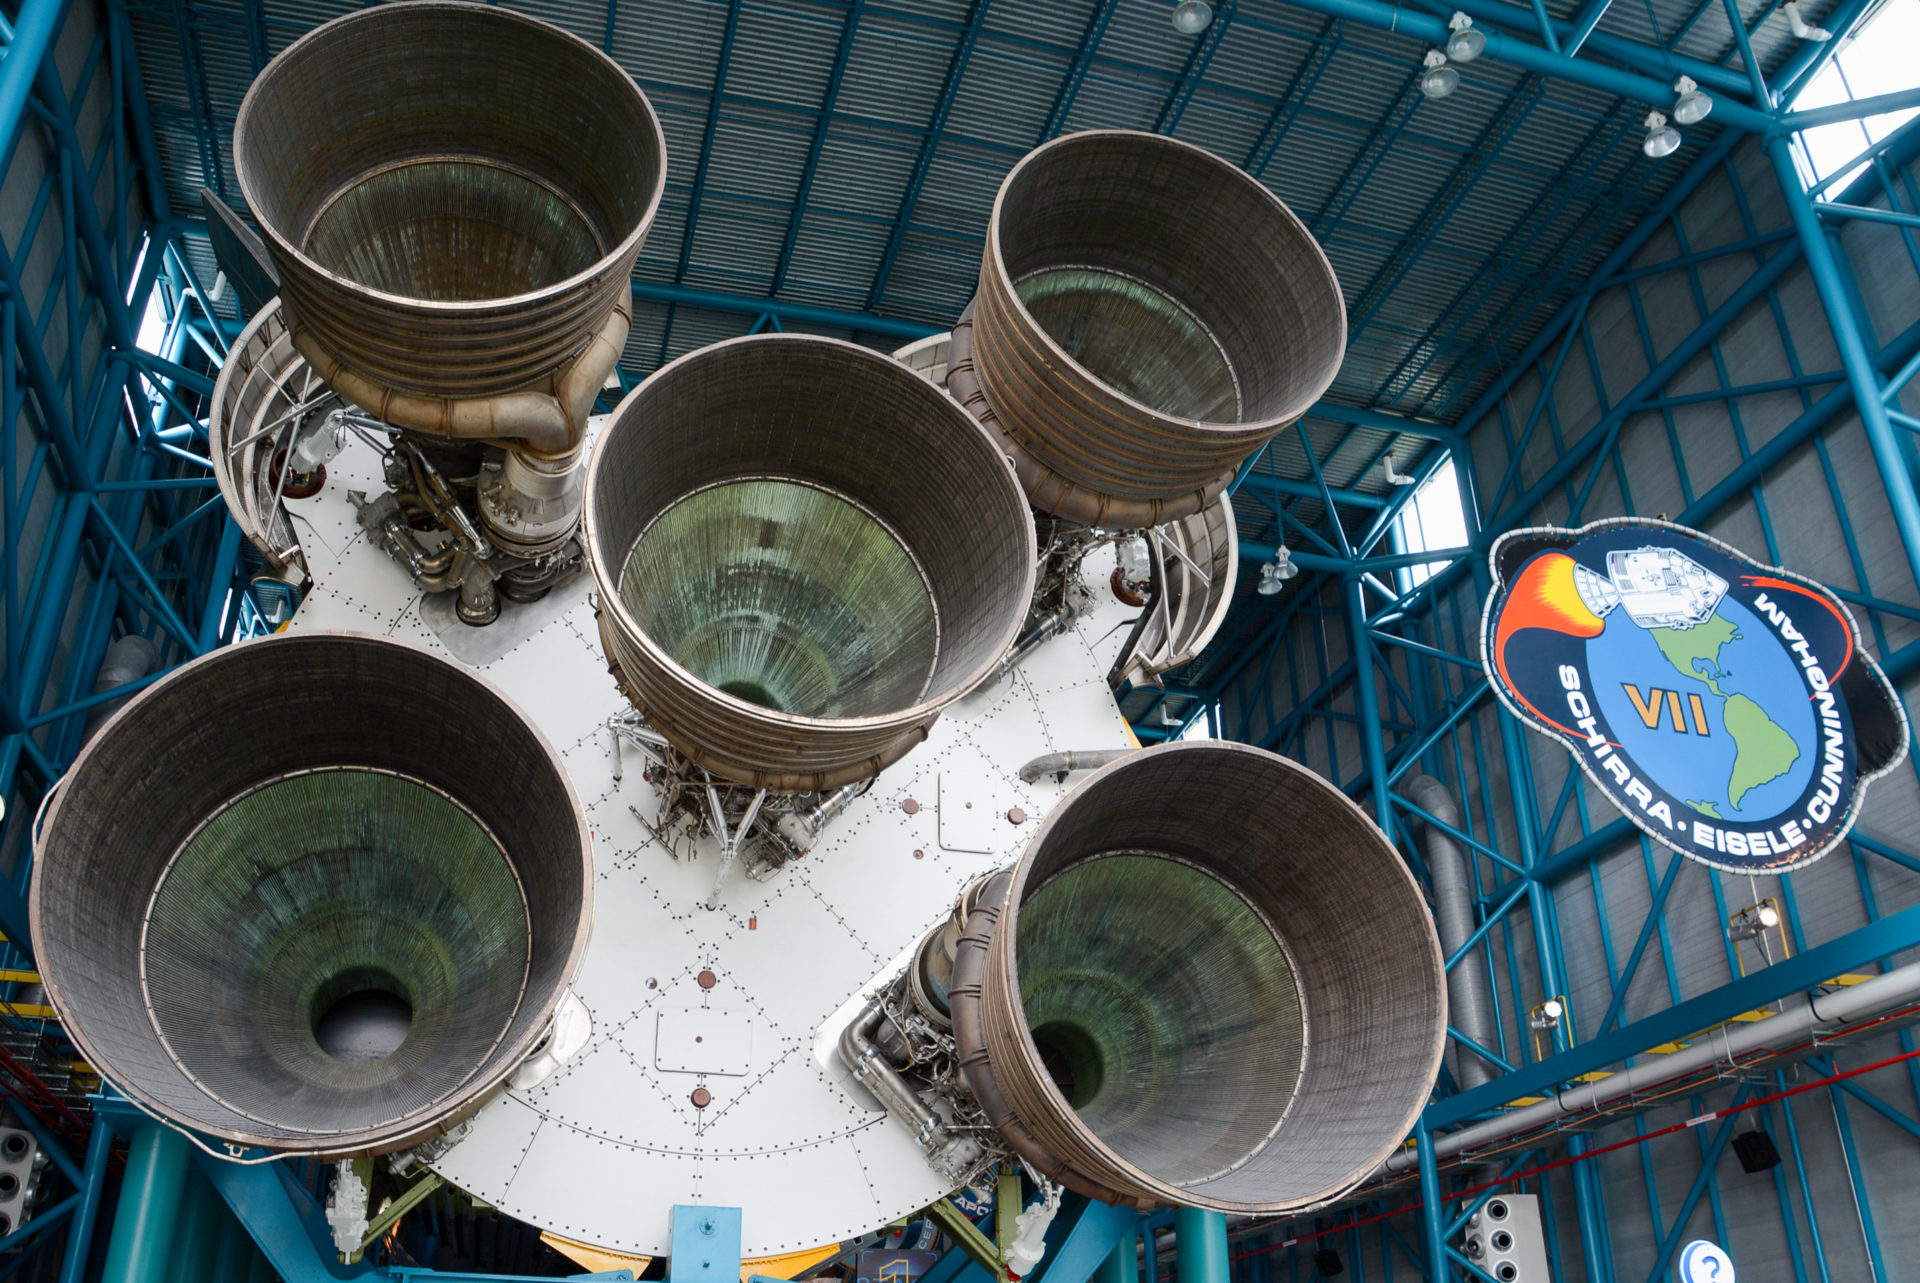 Raketentriebwerke im Kenndy Space Center